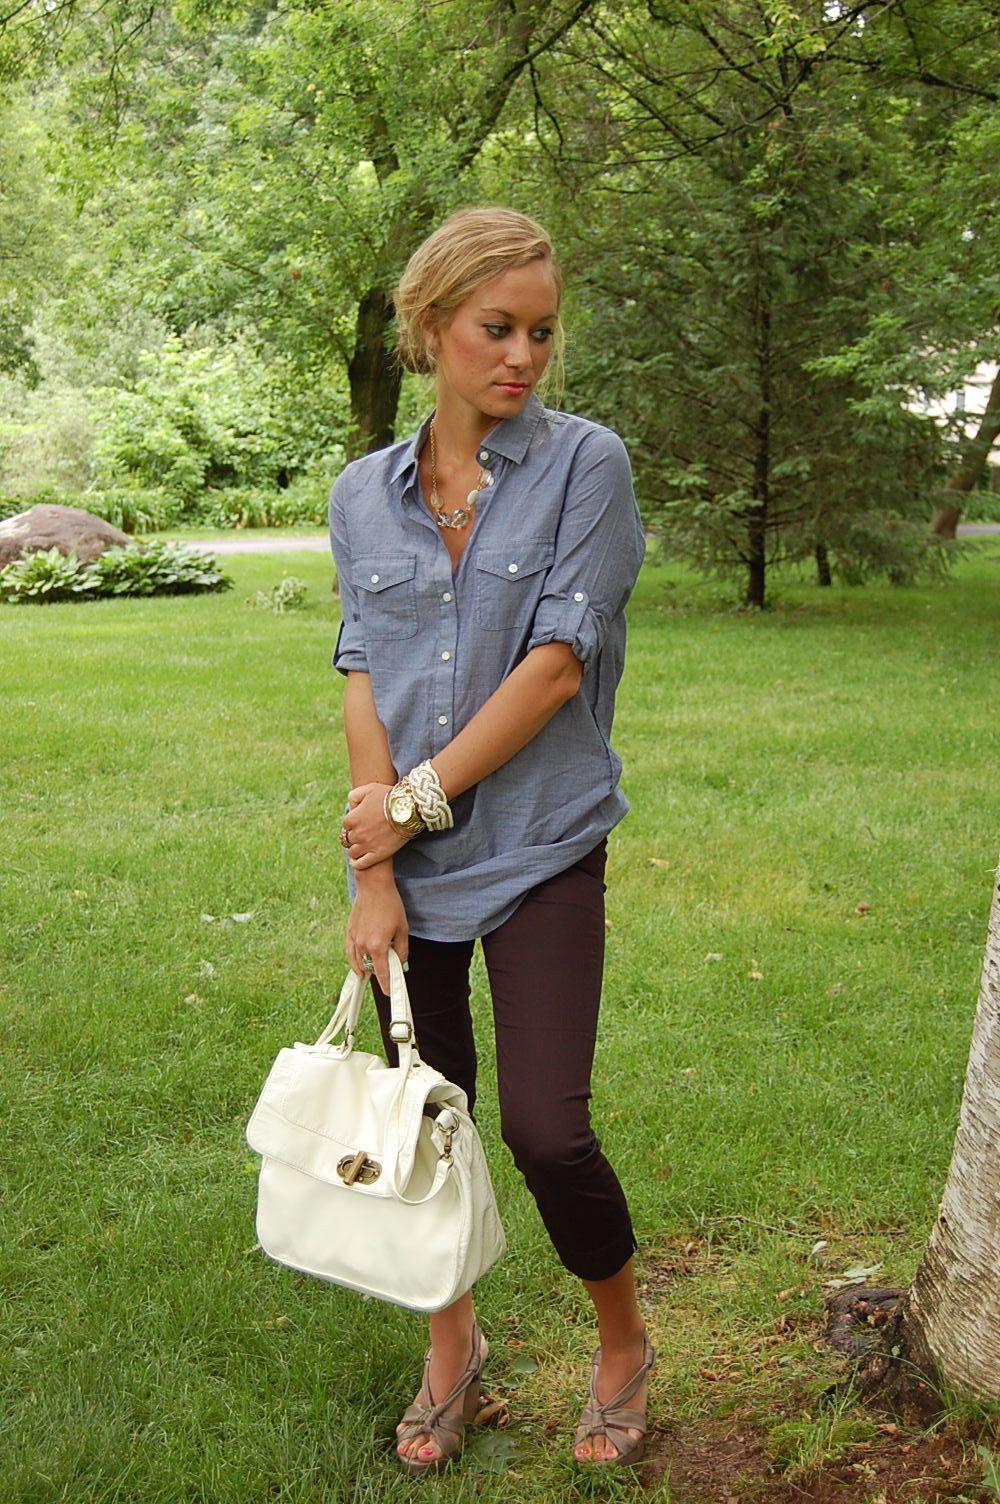 #outfit #blogger #fashion http://tastesandstyle.blogspot.com